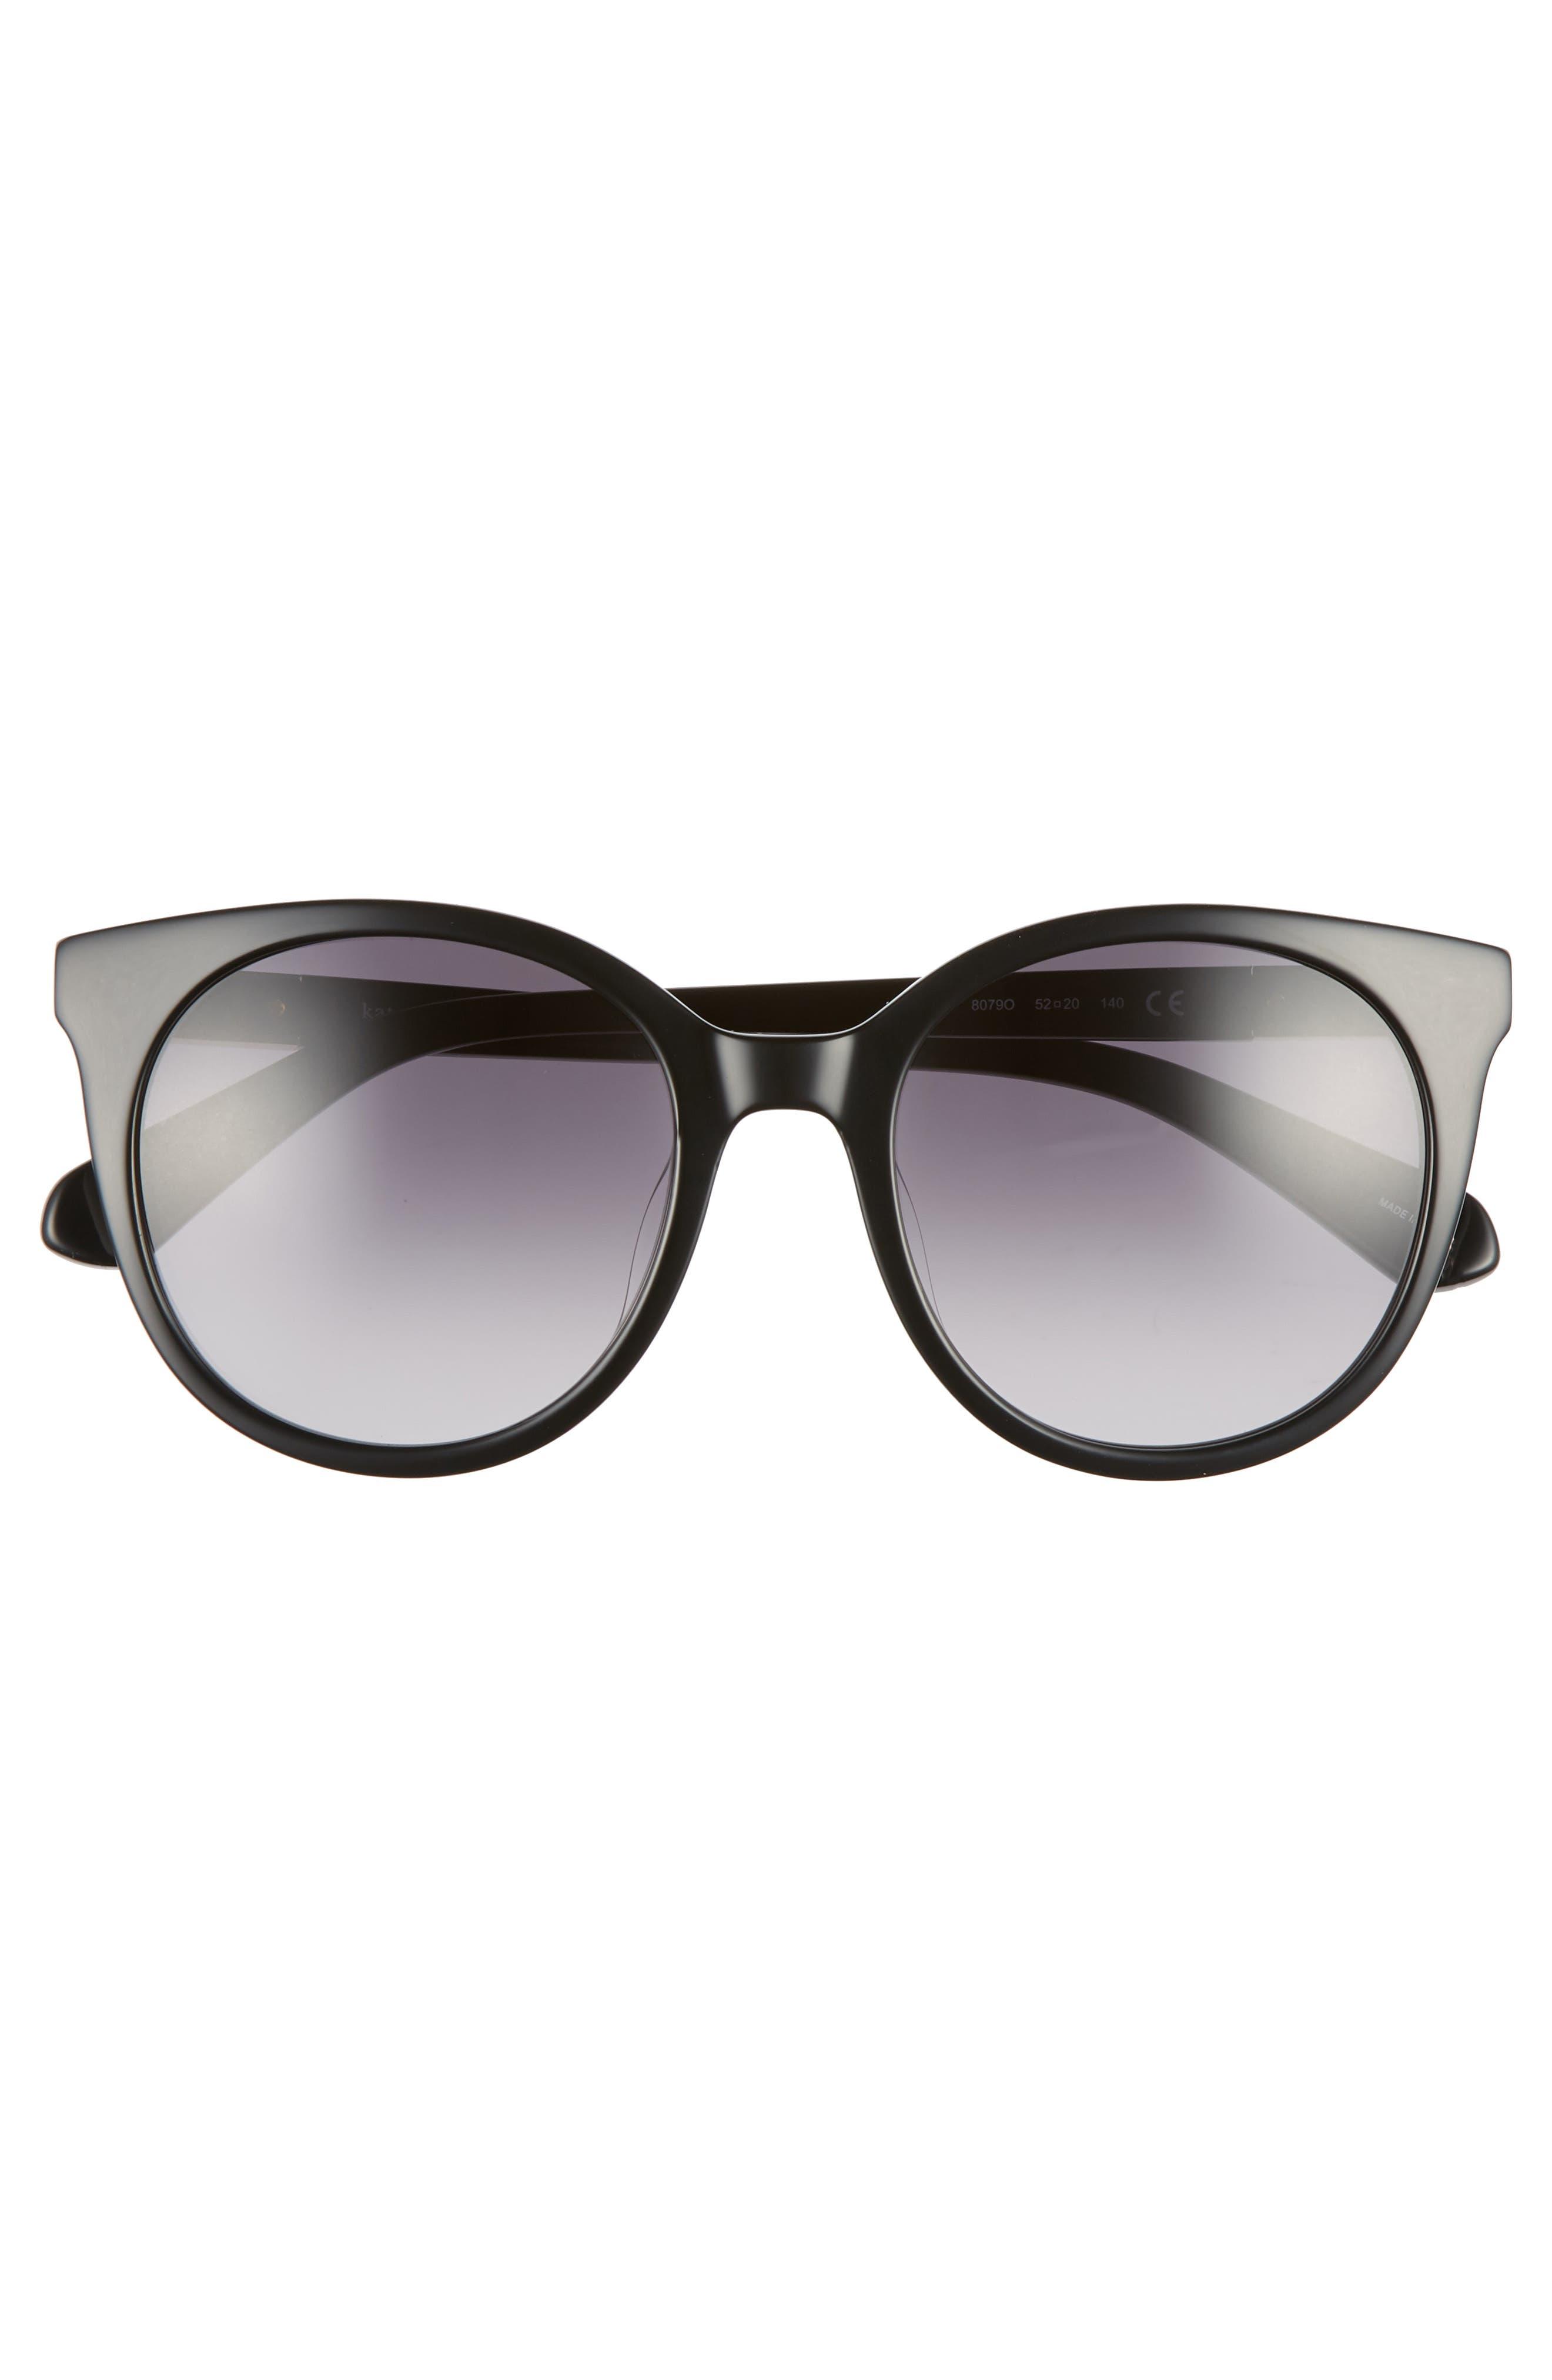 akayla 52mm cat eye sunglasses,                             Alternate thumbnail 3, color,                             BLACK